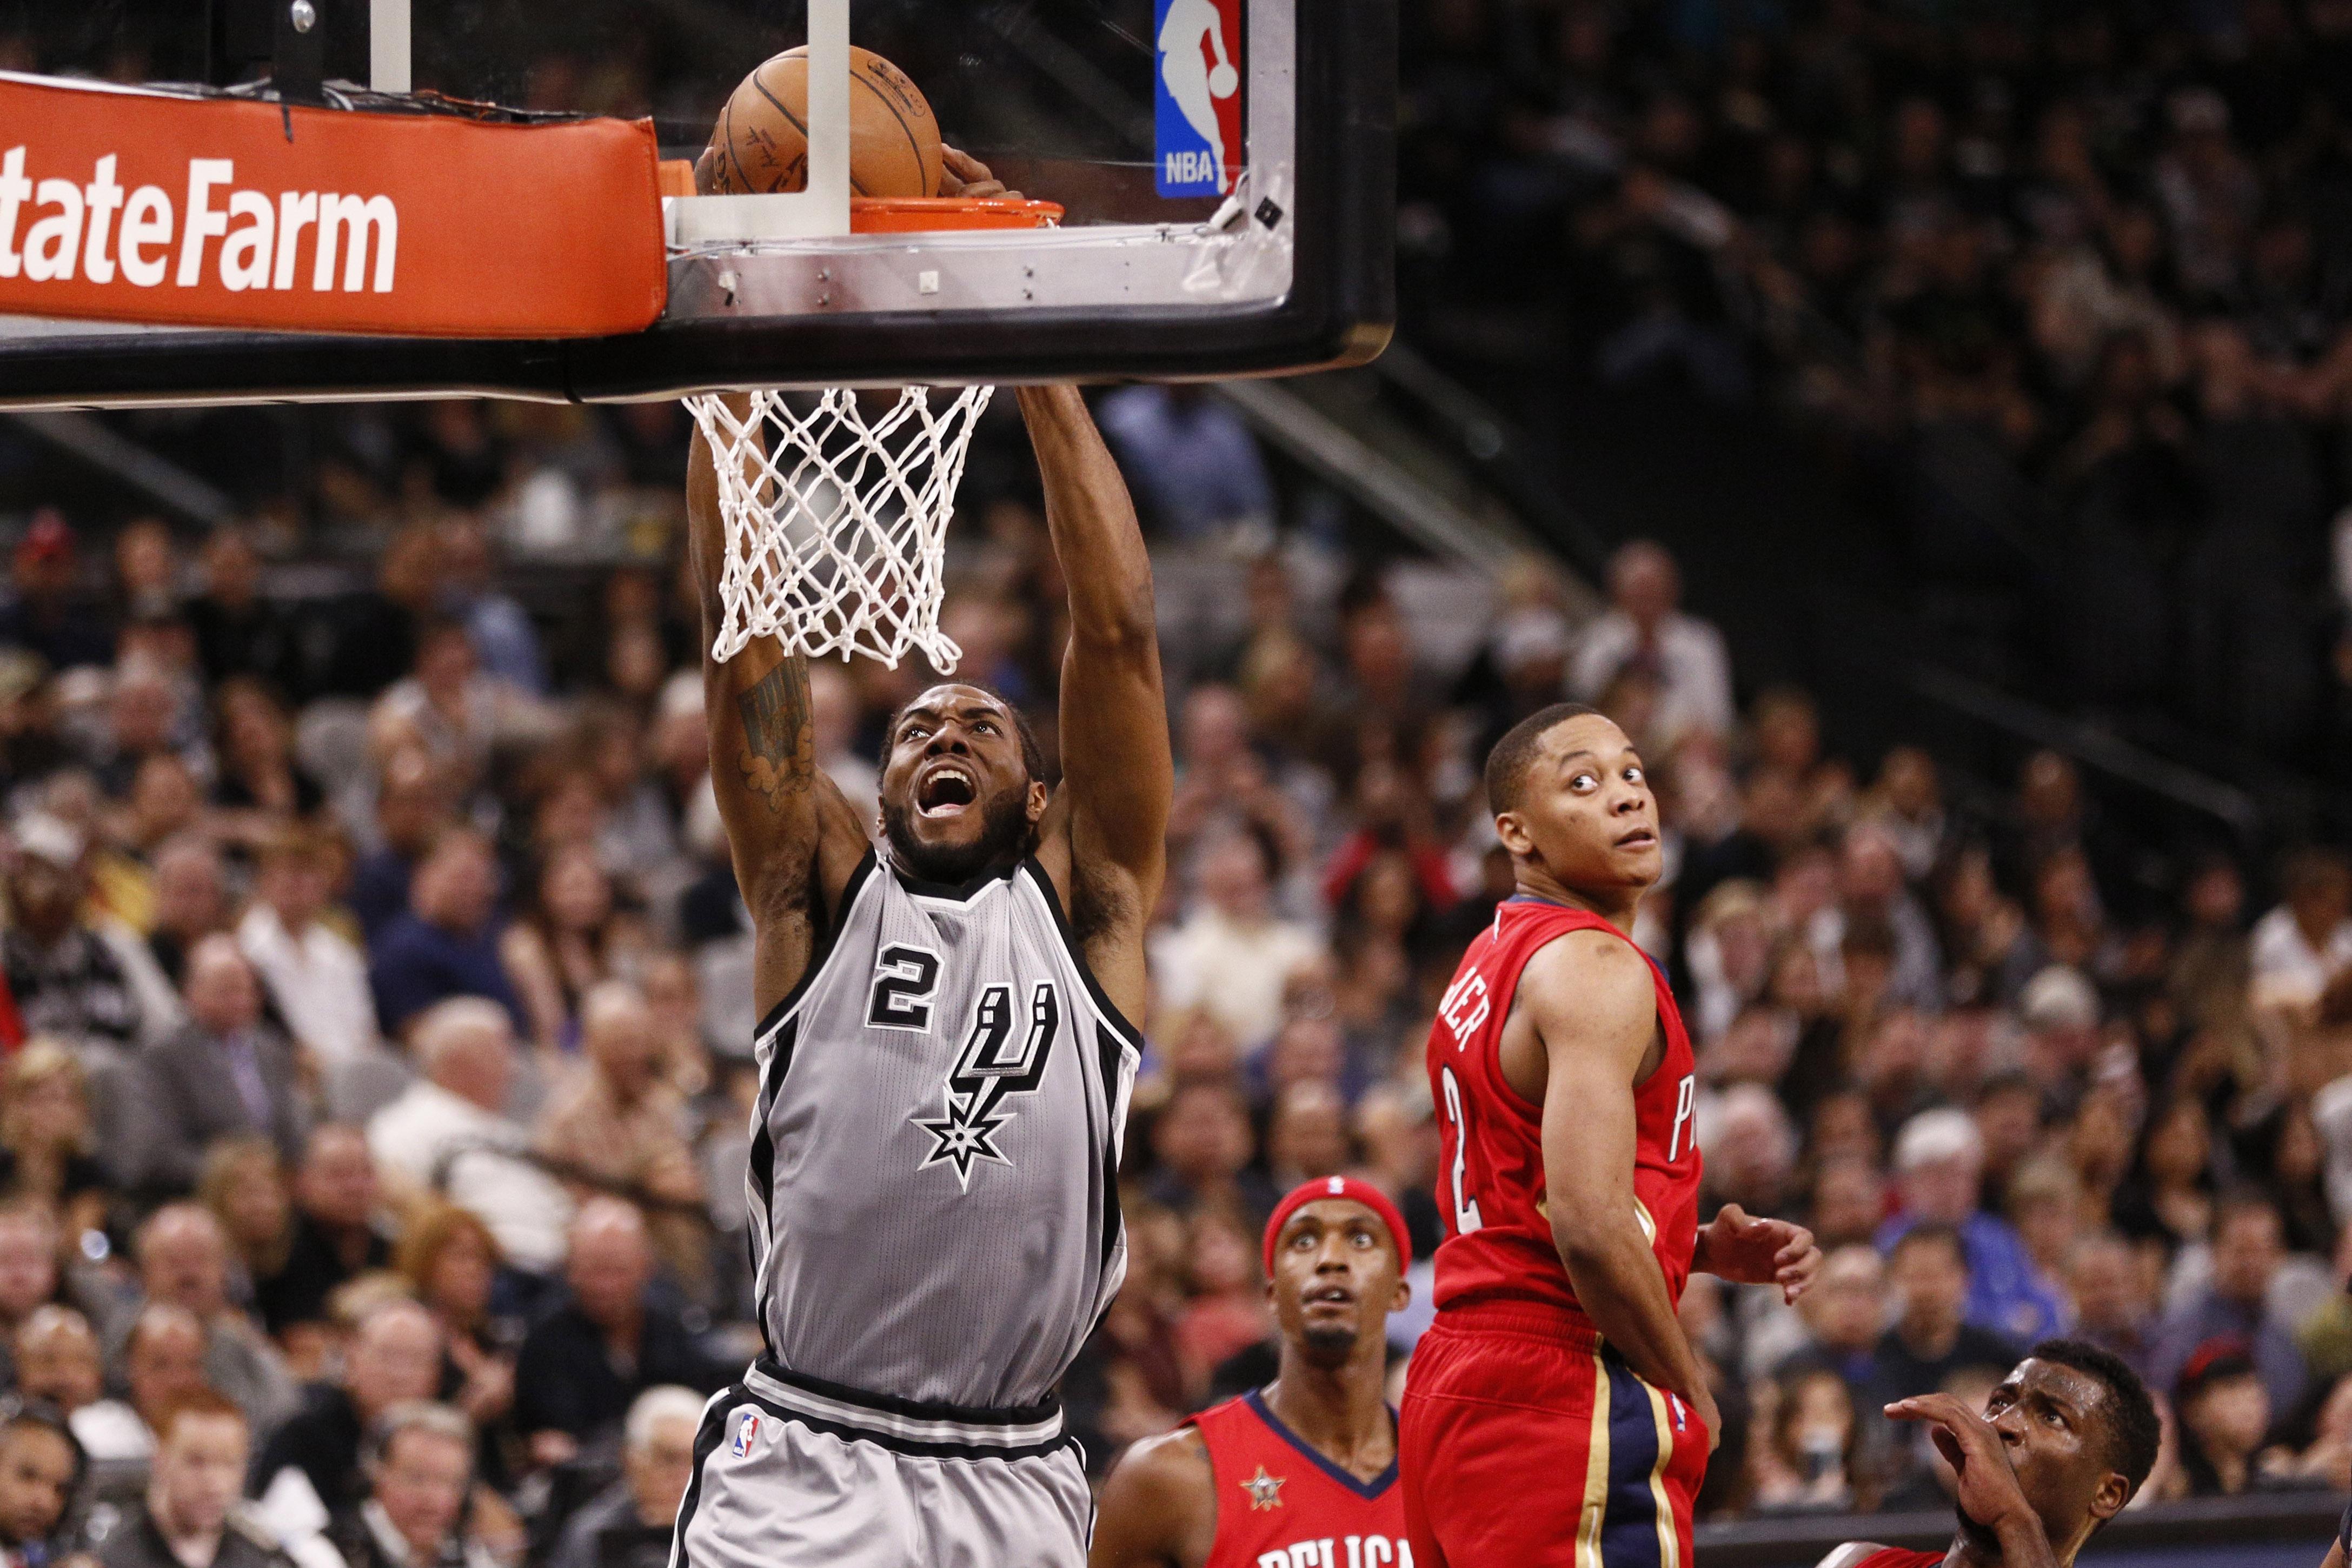 NBA: New Orleans Pelicans at San Antonio Spurs